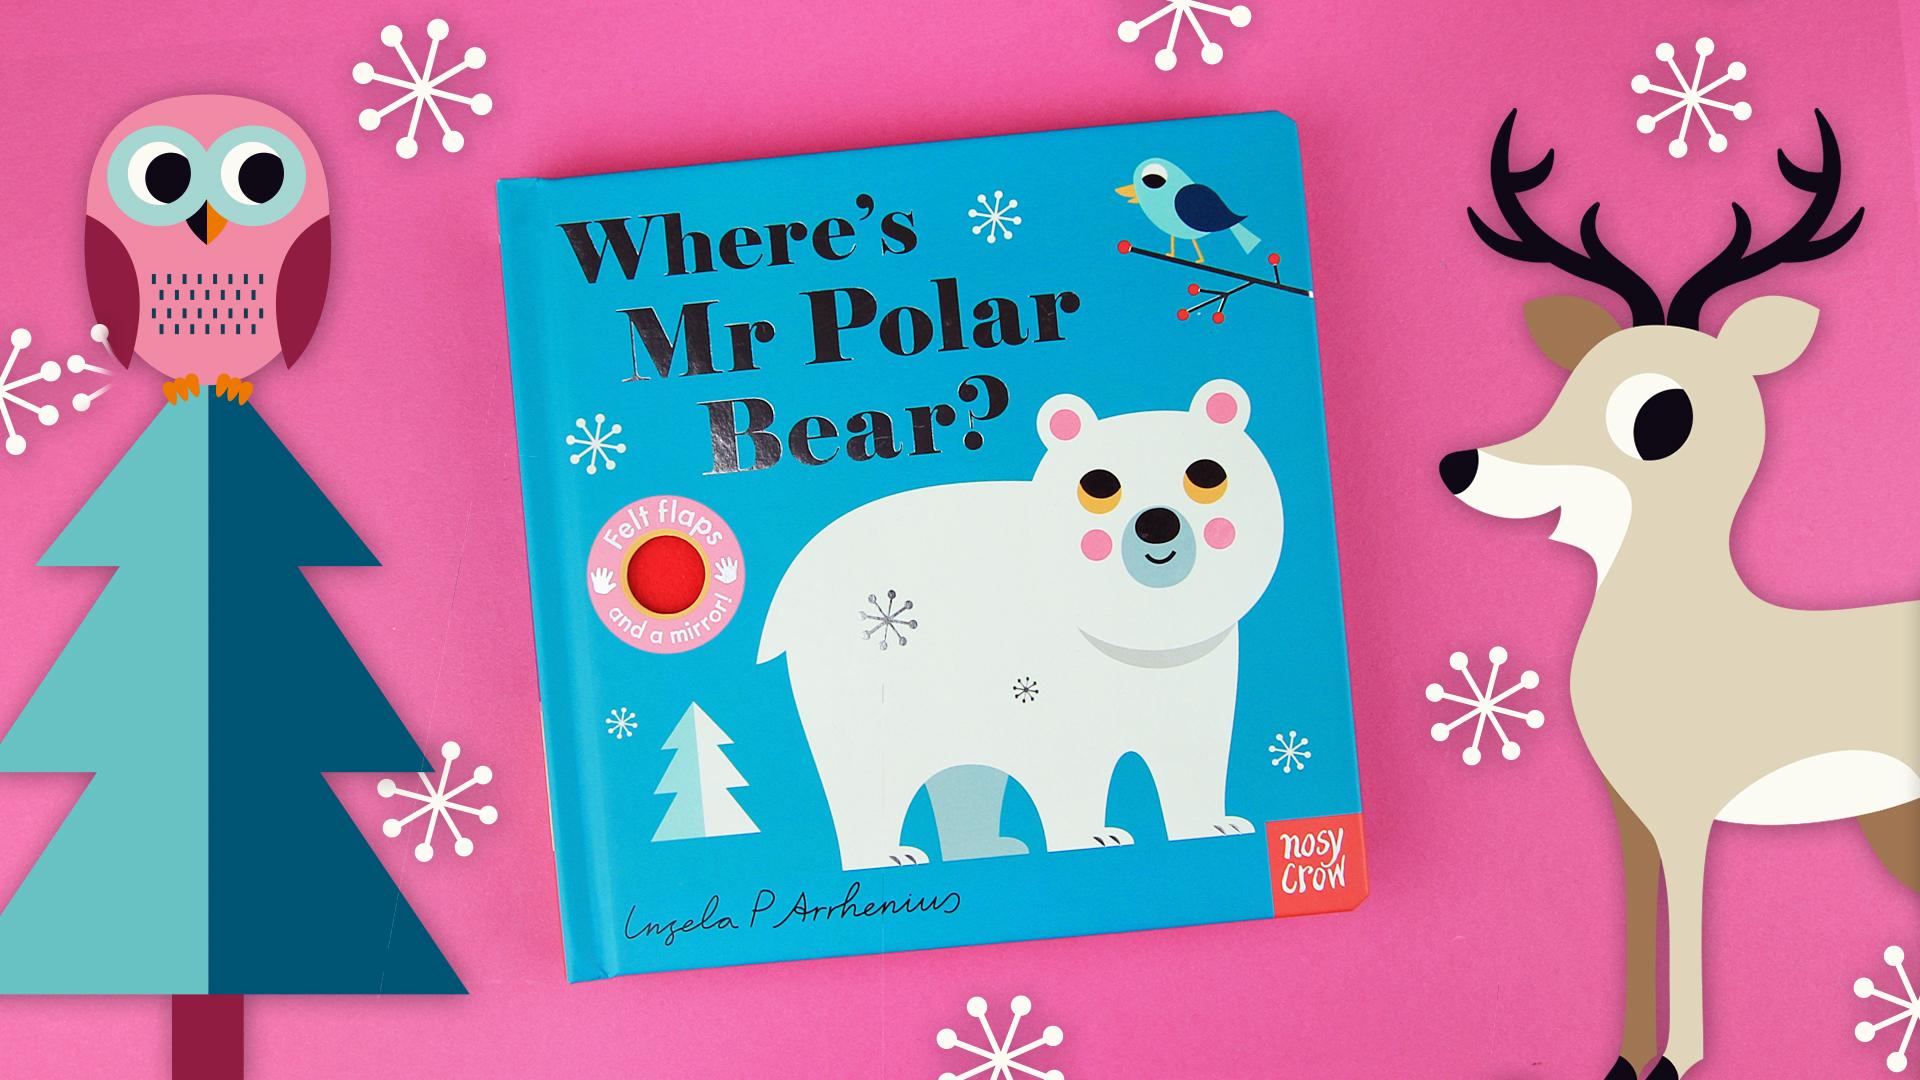 Take a look inside Where's Mr Polar Bear